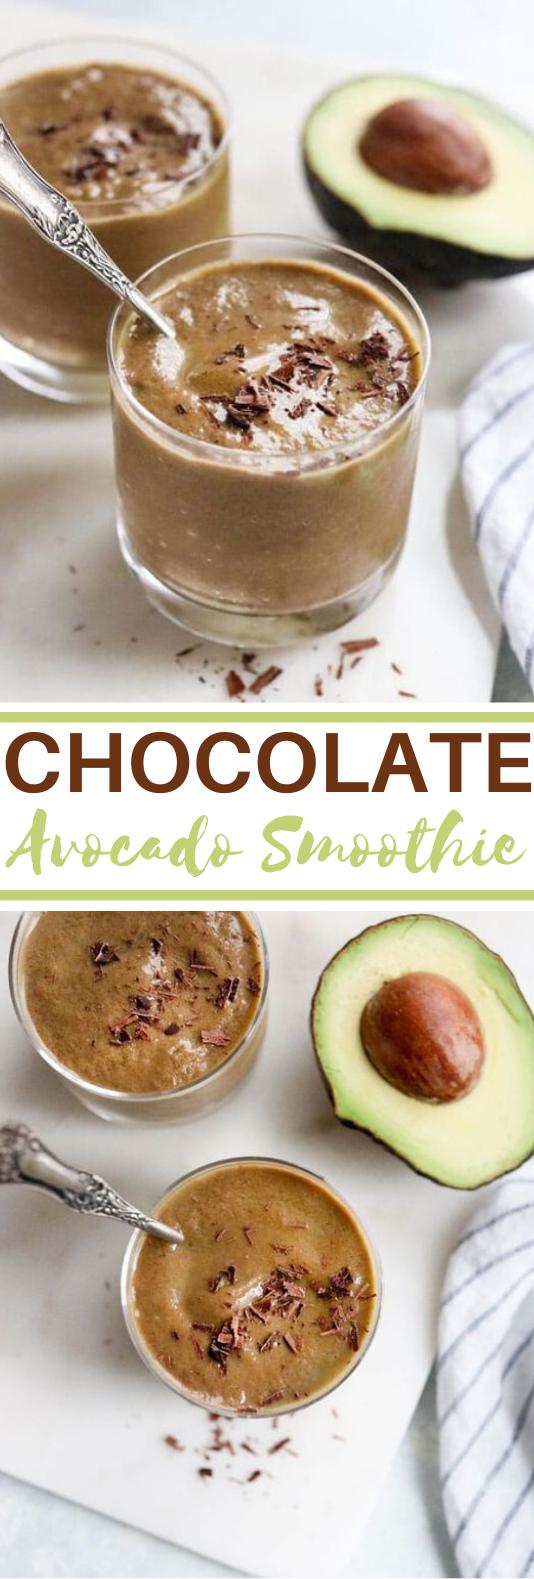 Chocolate Avocado Smoothie #drinks #healthy #smoothie #breakfast #vegan